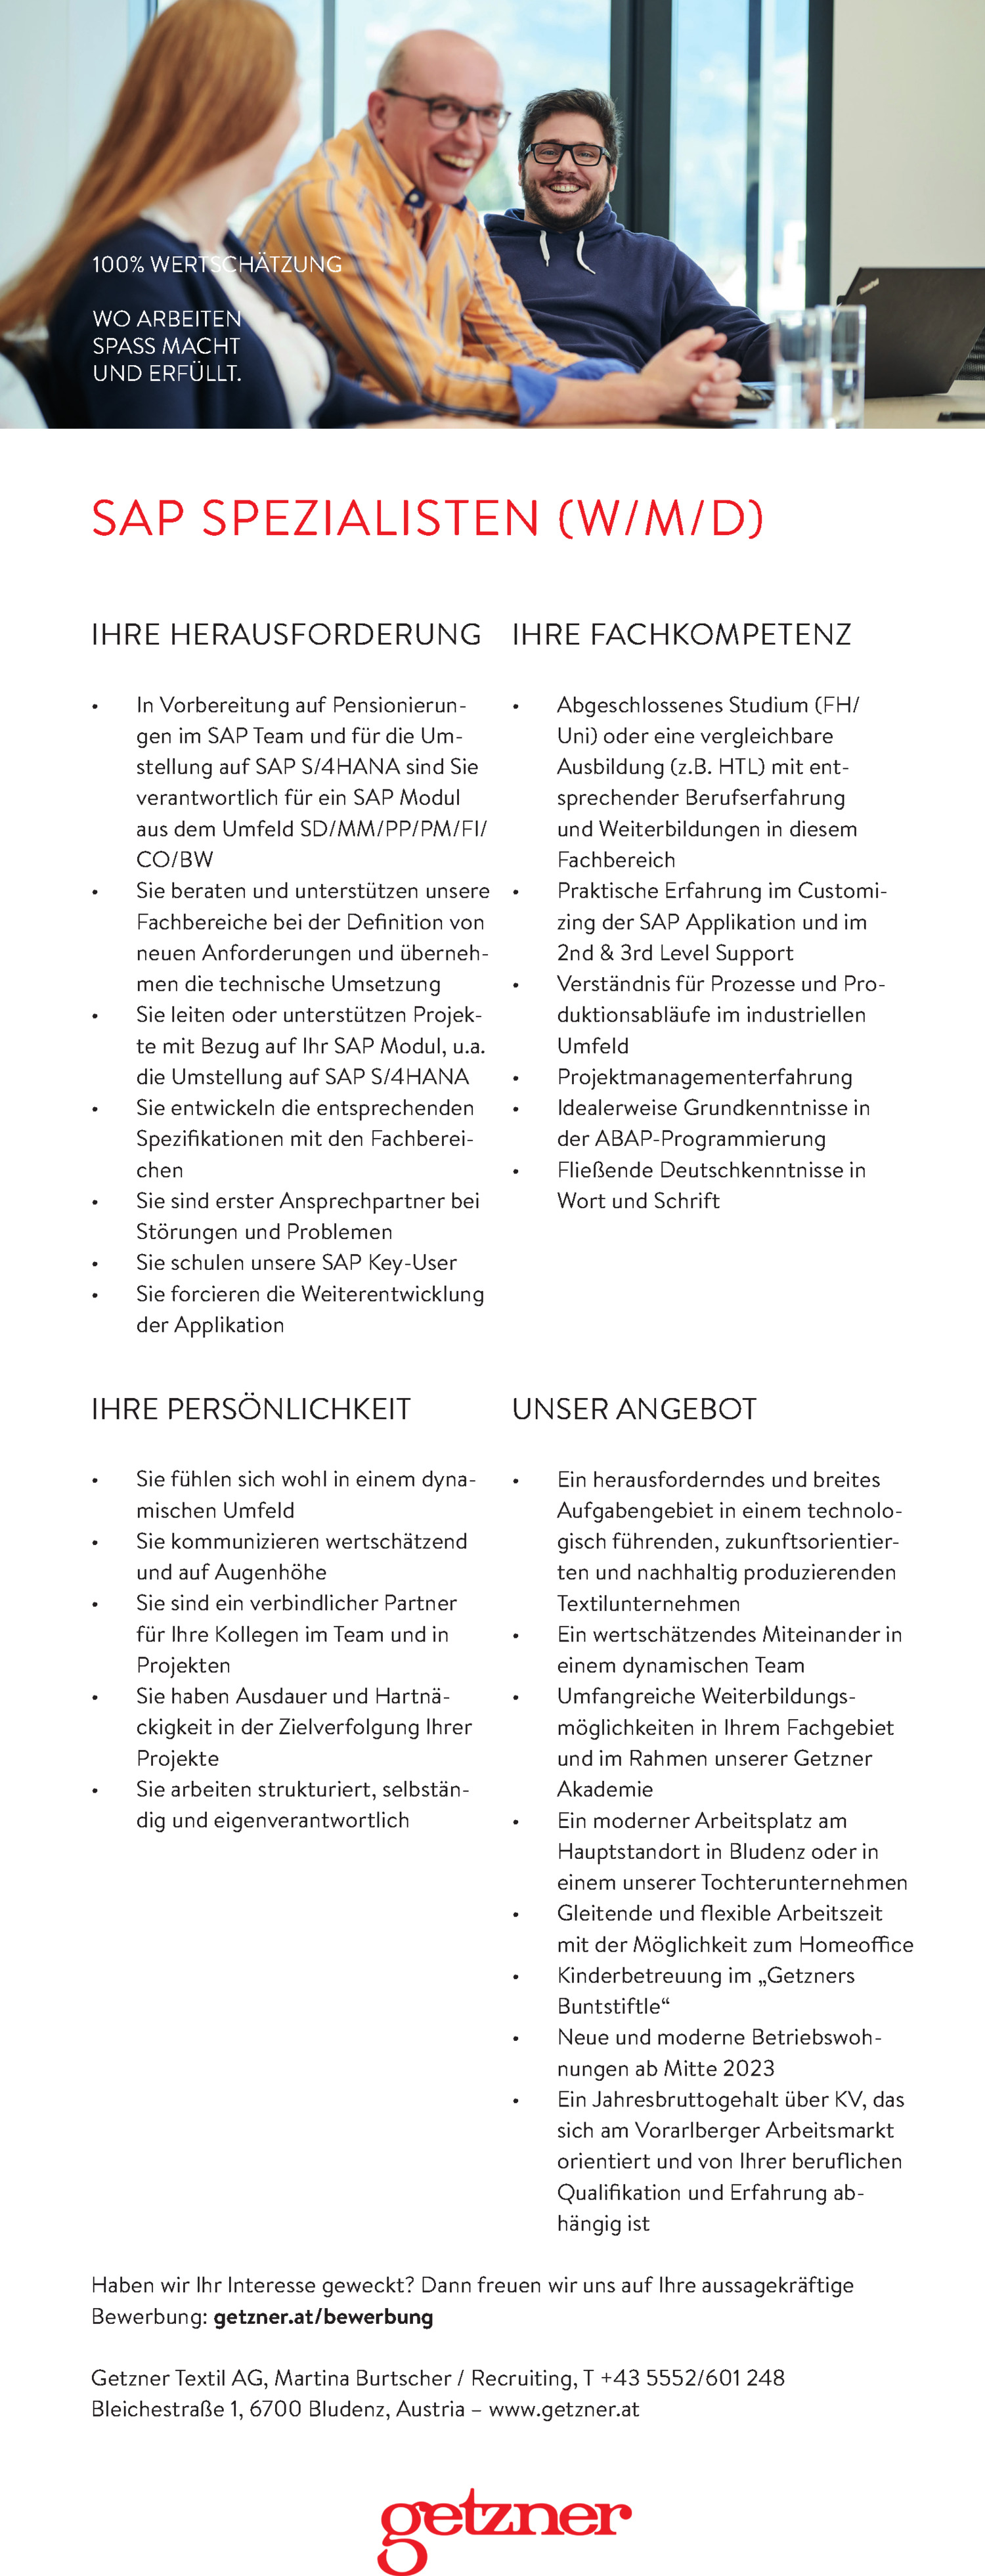 Inserat SAP SPEZIALISTEN (W/M/D)